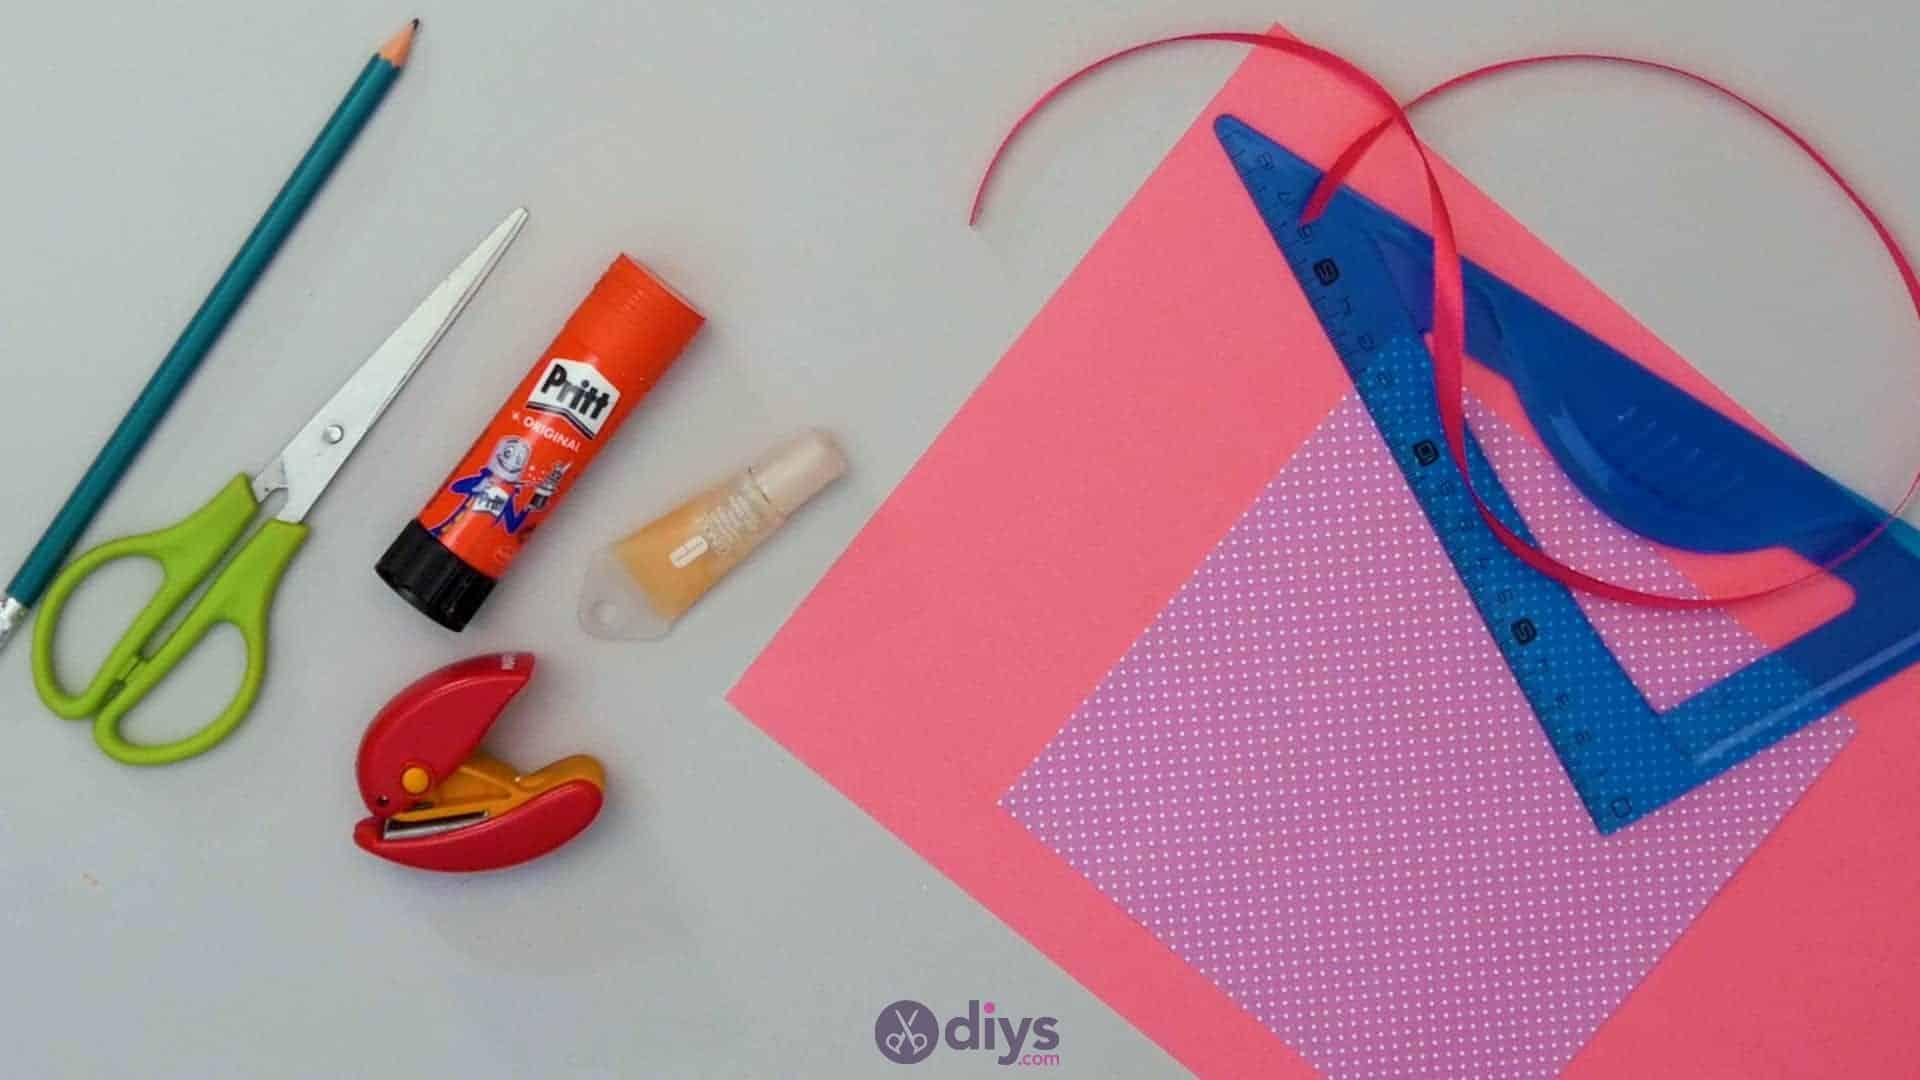 Diy lipstick gift card materials step 1